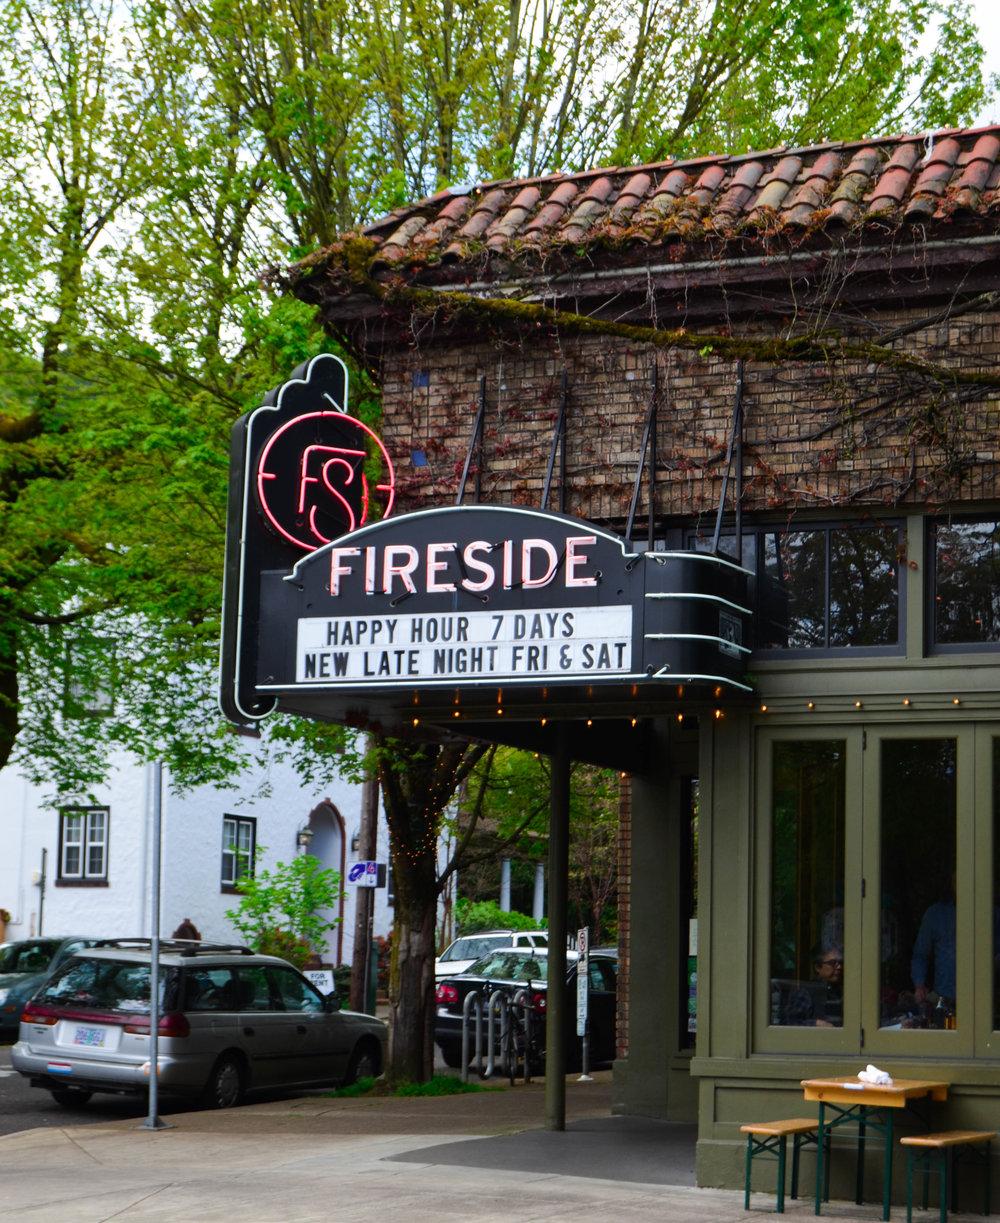 Fireside - 801 NW 23rd Ave.